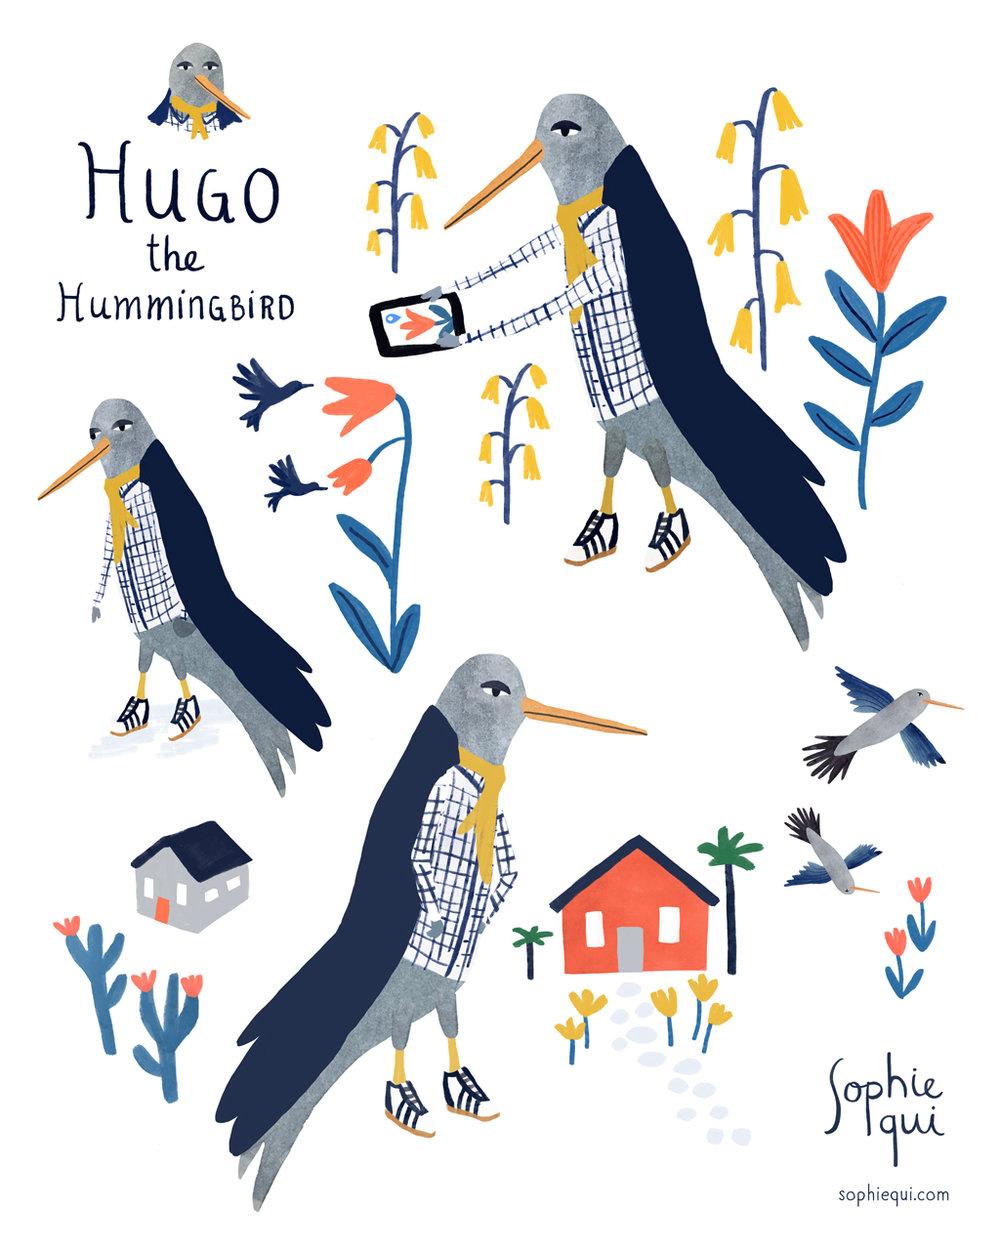 hugothehummingbird-sophiequi.jpg